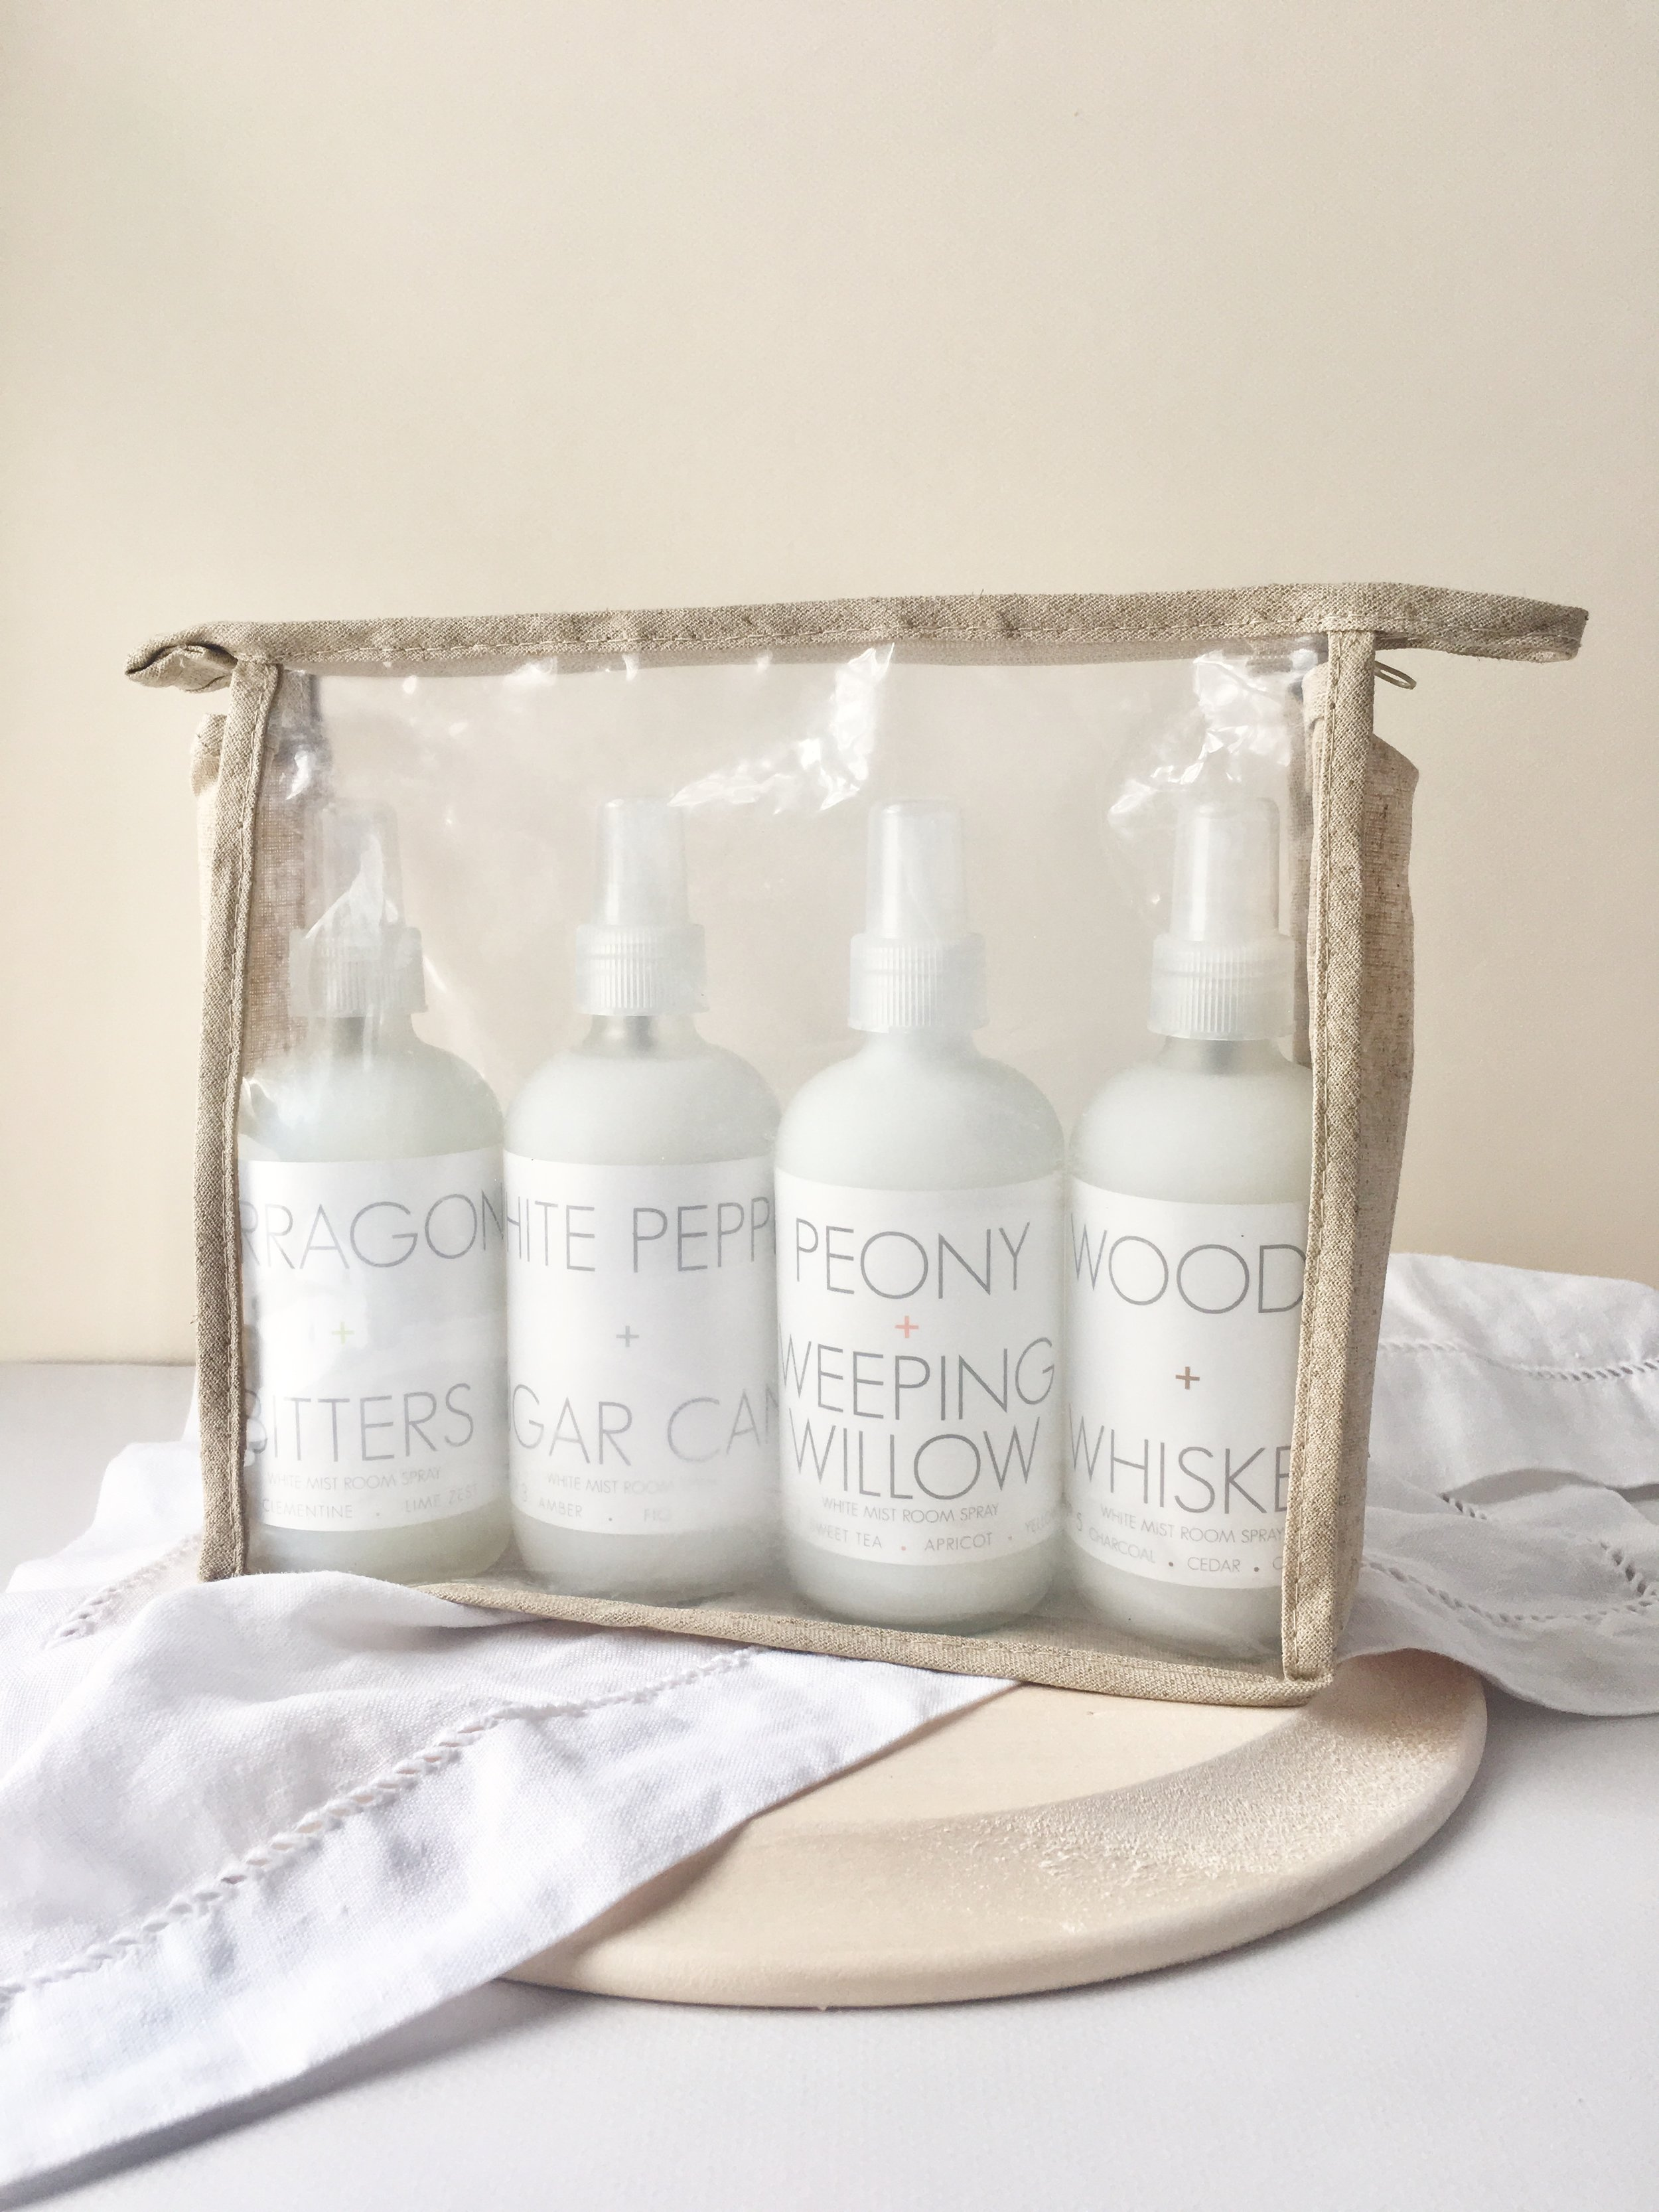 RICA bath + body White Mist Room Spray Collection in pouch.jpg